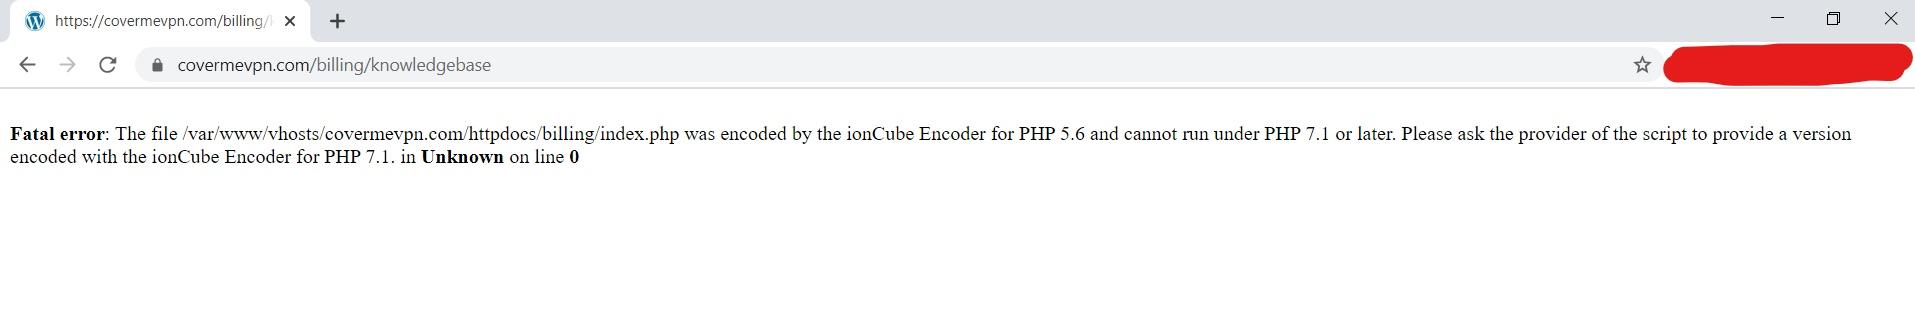 CoverMeVPN knowlegebase error